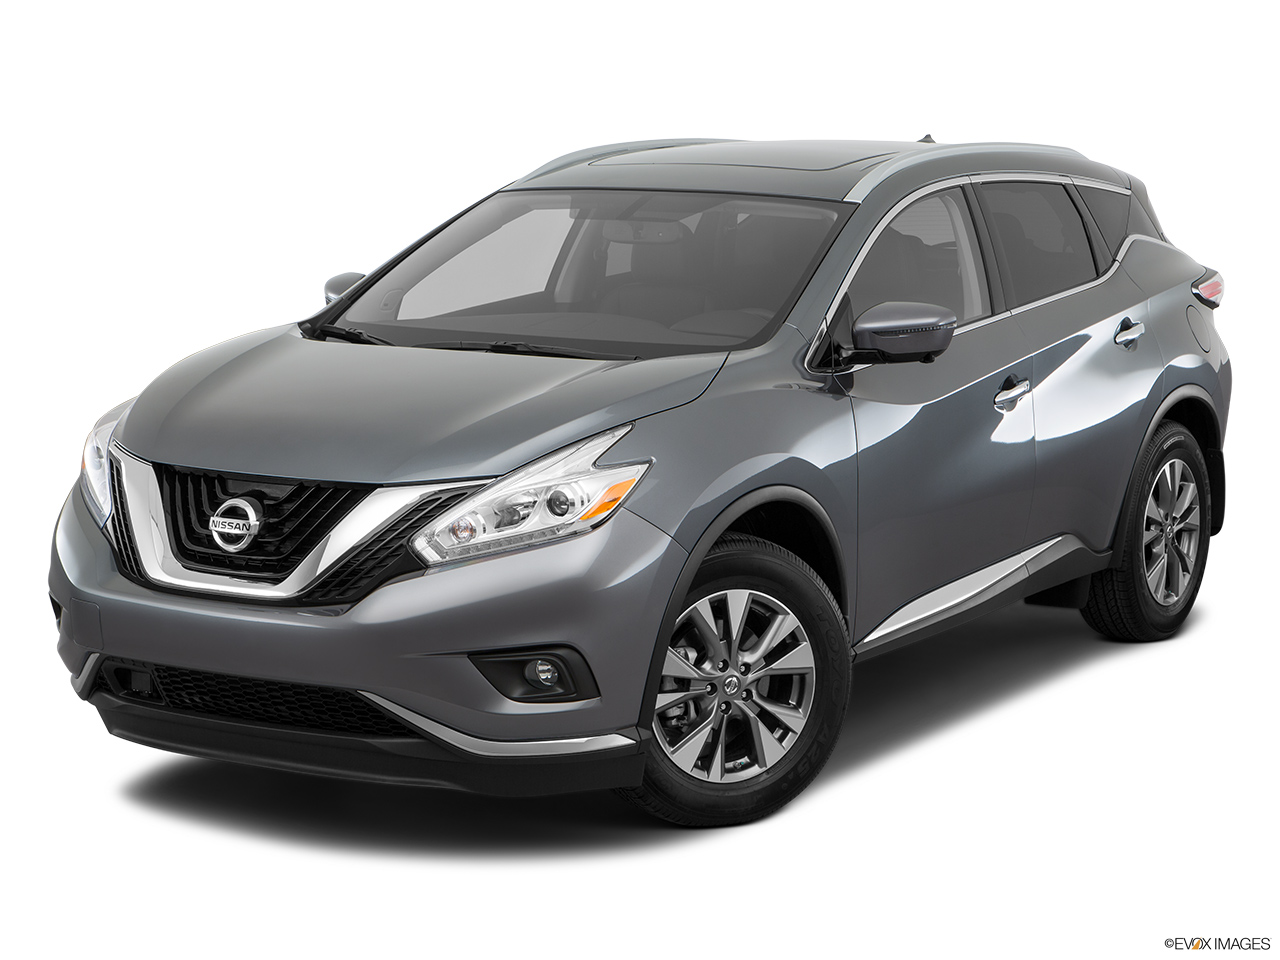 Nissan Murano 2016 3 5l Sl In Uae New Car Prices Specs